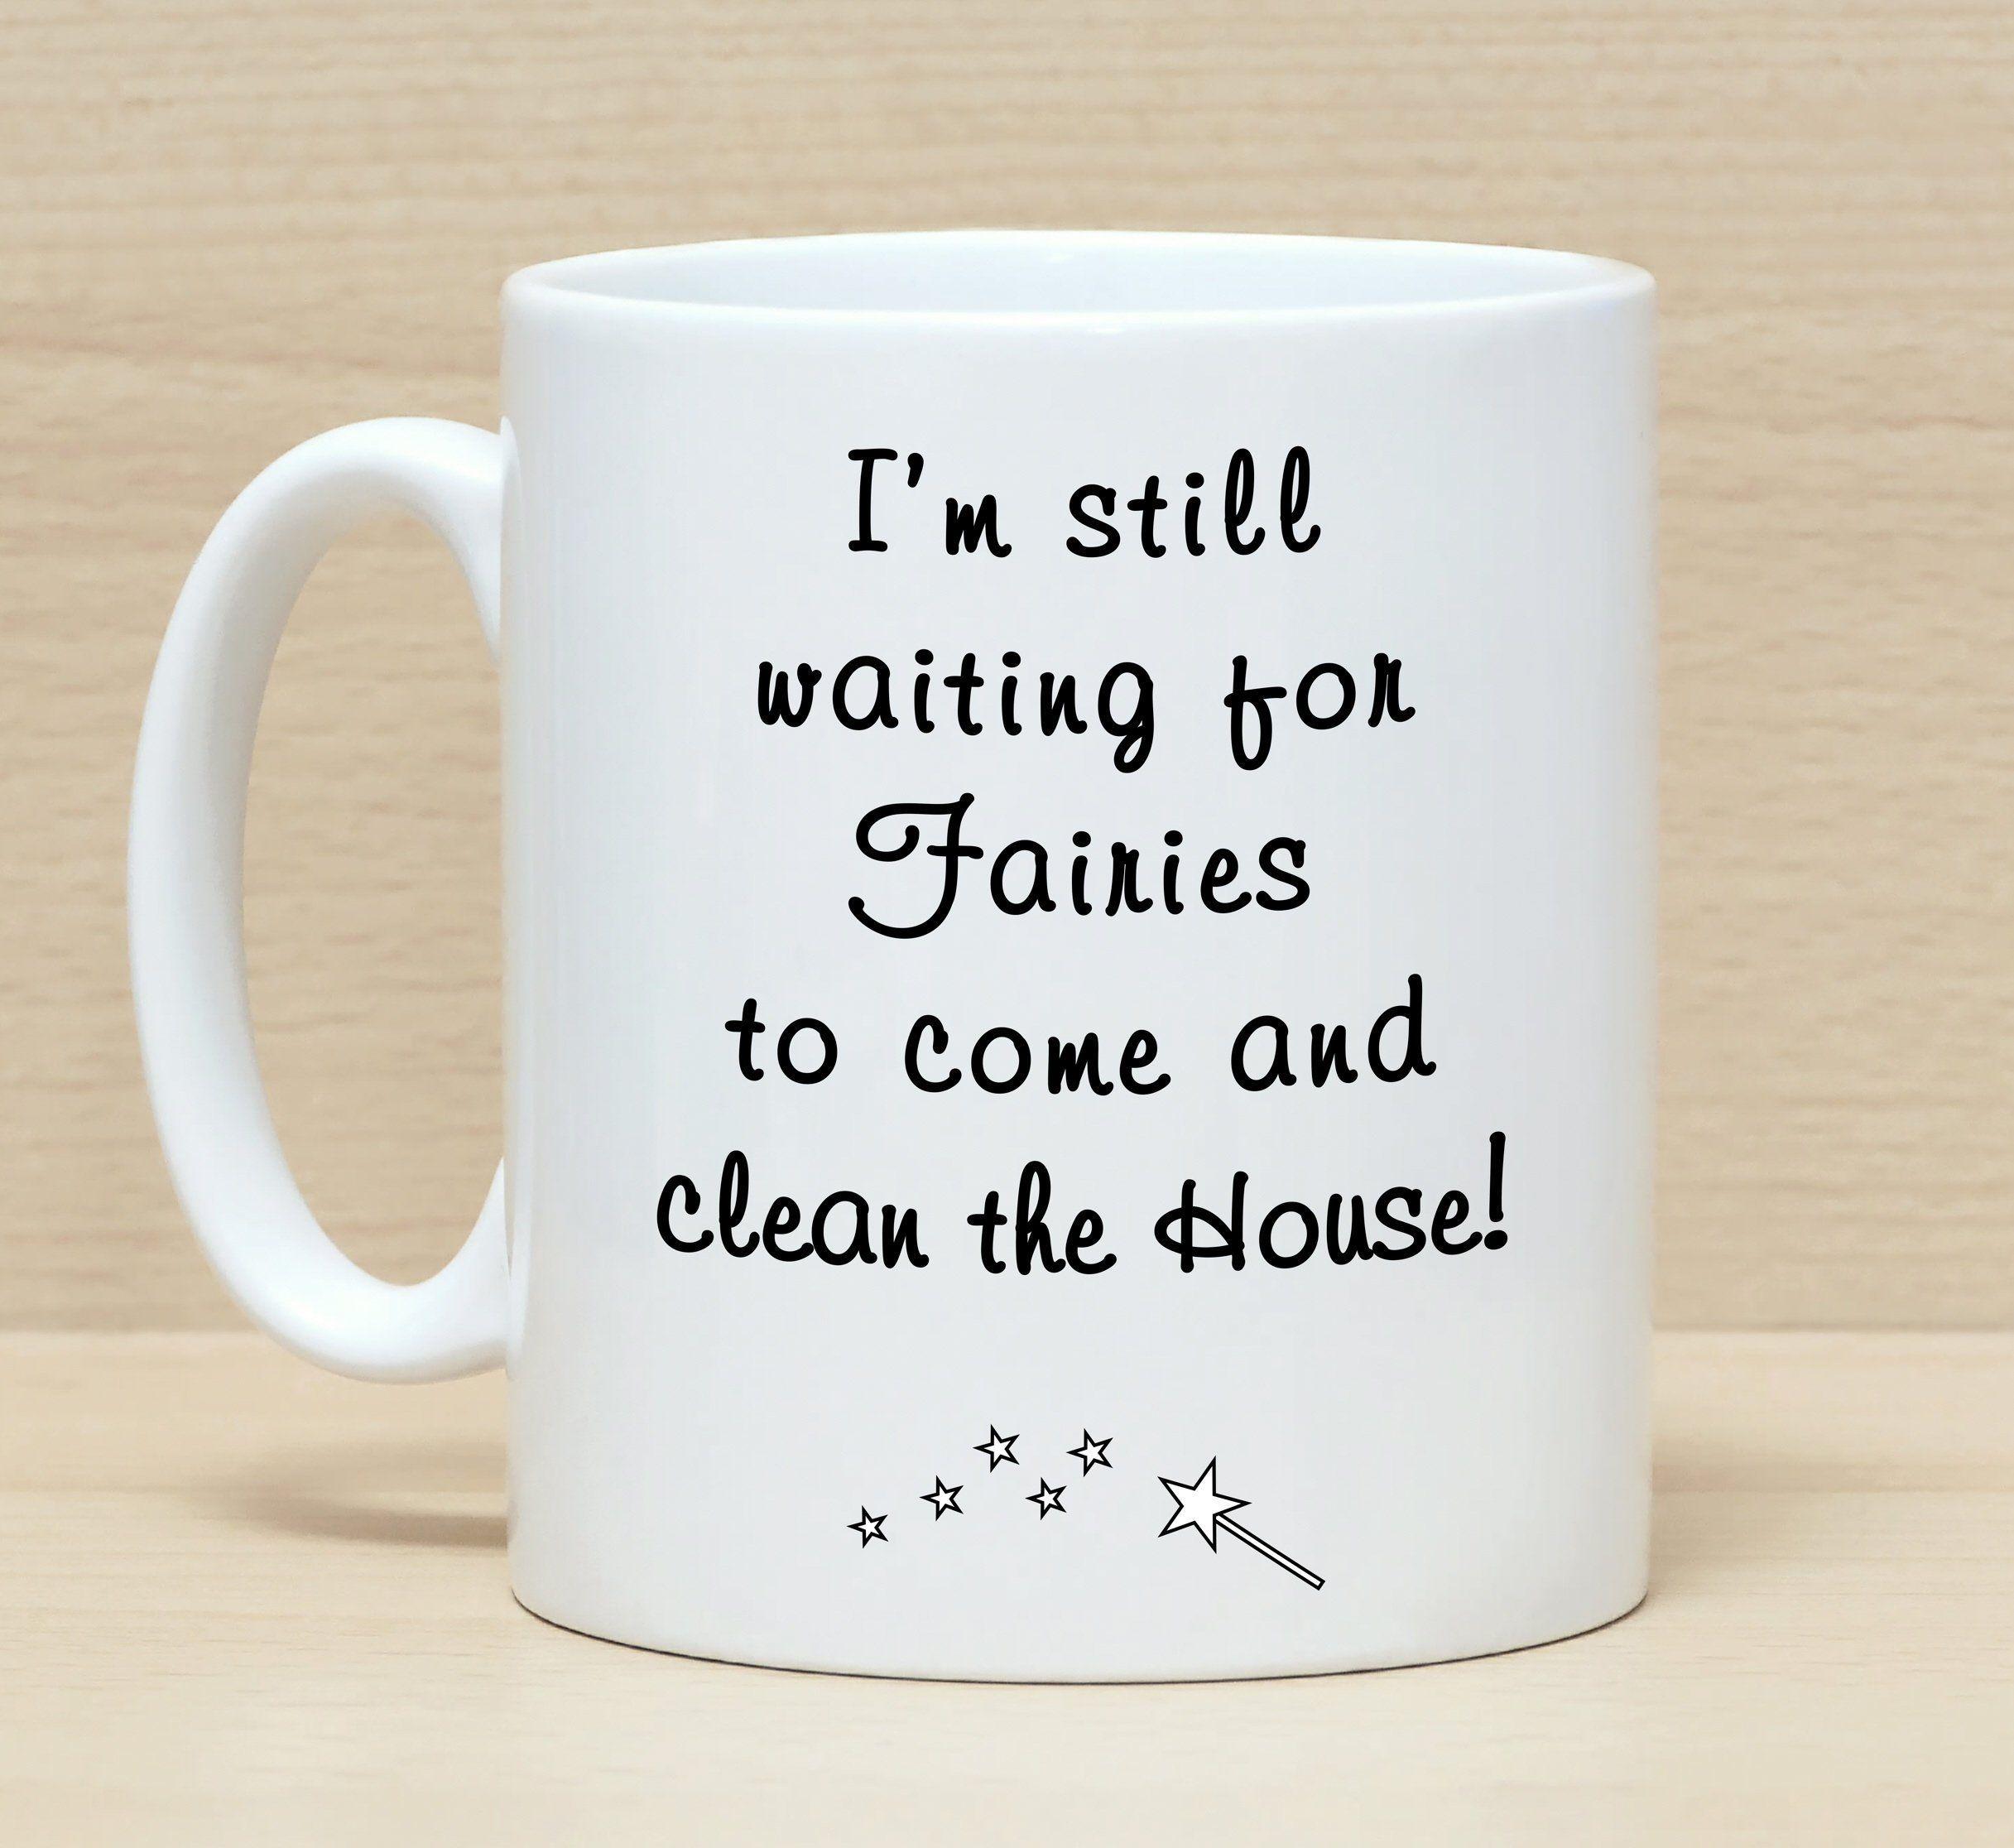 Mug With Saying Birthday Mug Funny Coffee Mugs Clean The House Mug Mug For Women Mug For Men Fu Work Quotes Funny Husband Quotes Funny Happy Quotes Funny